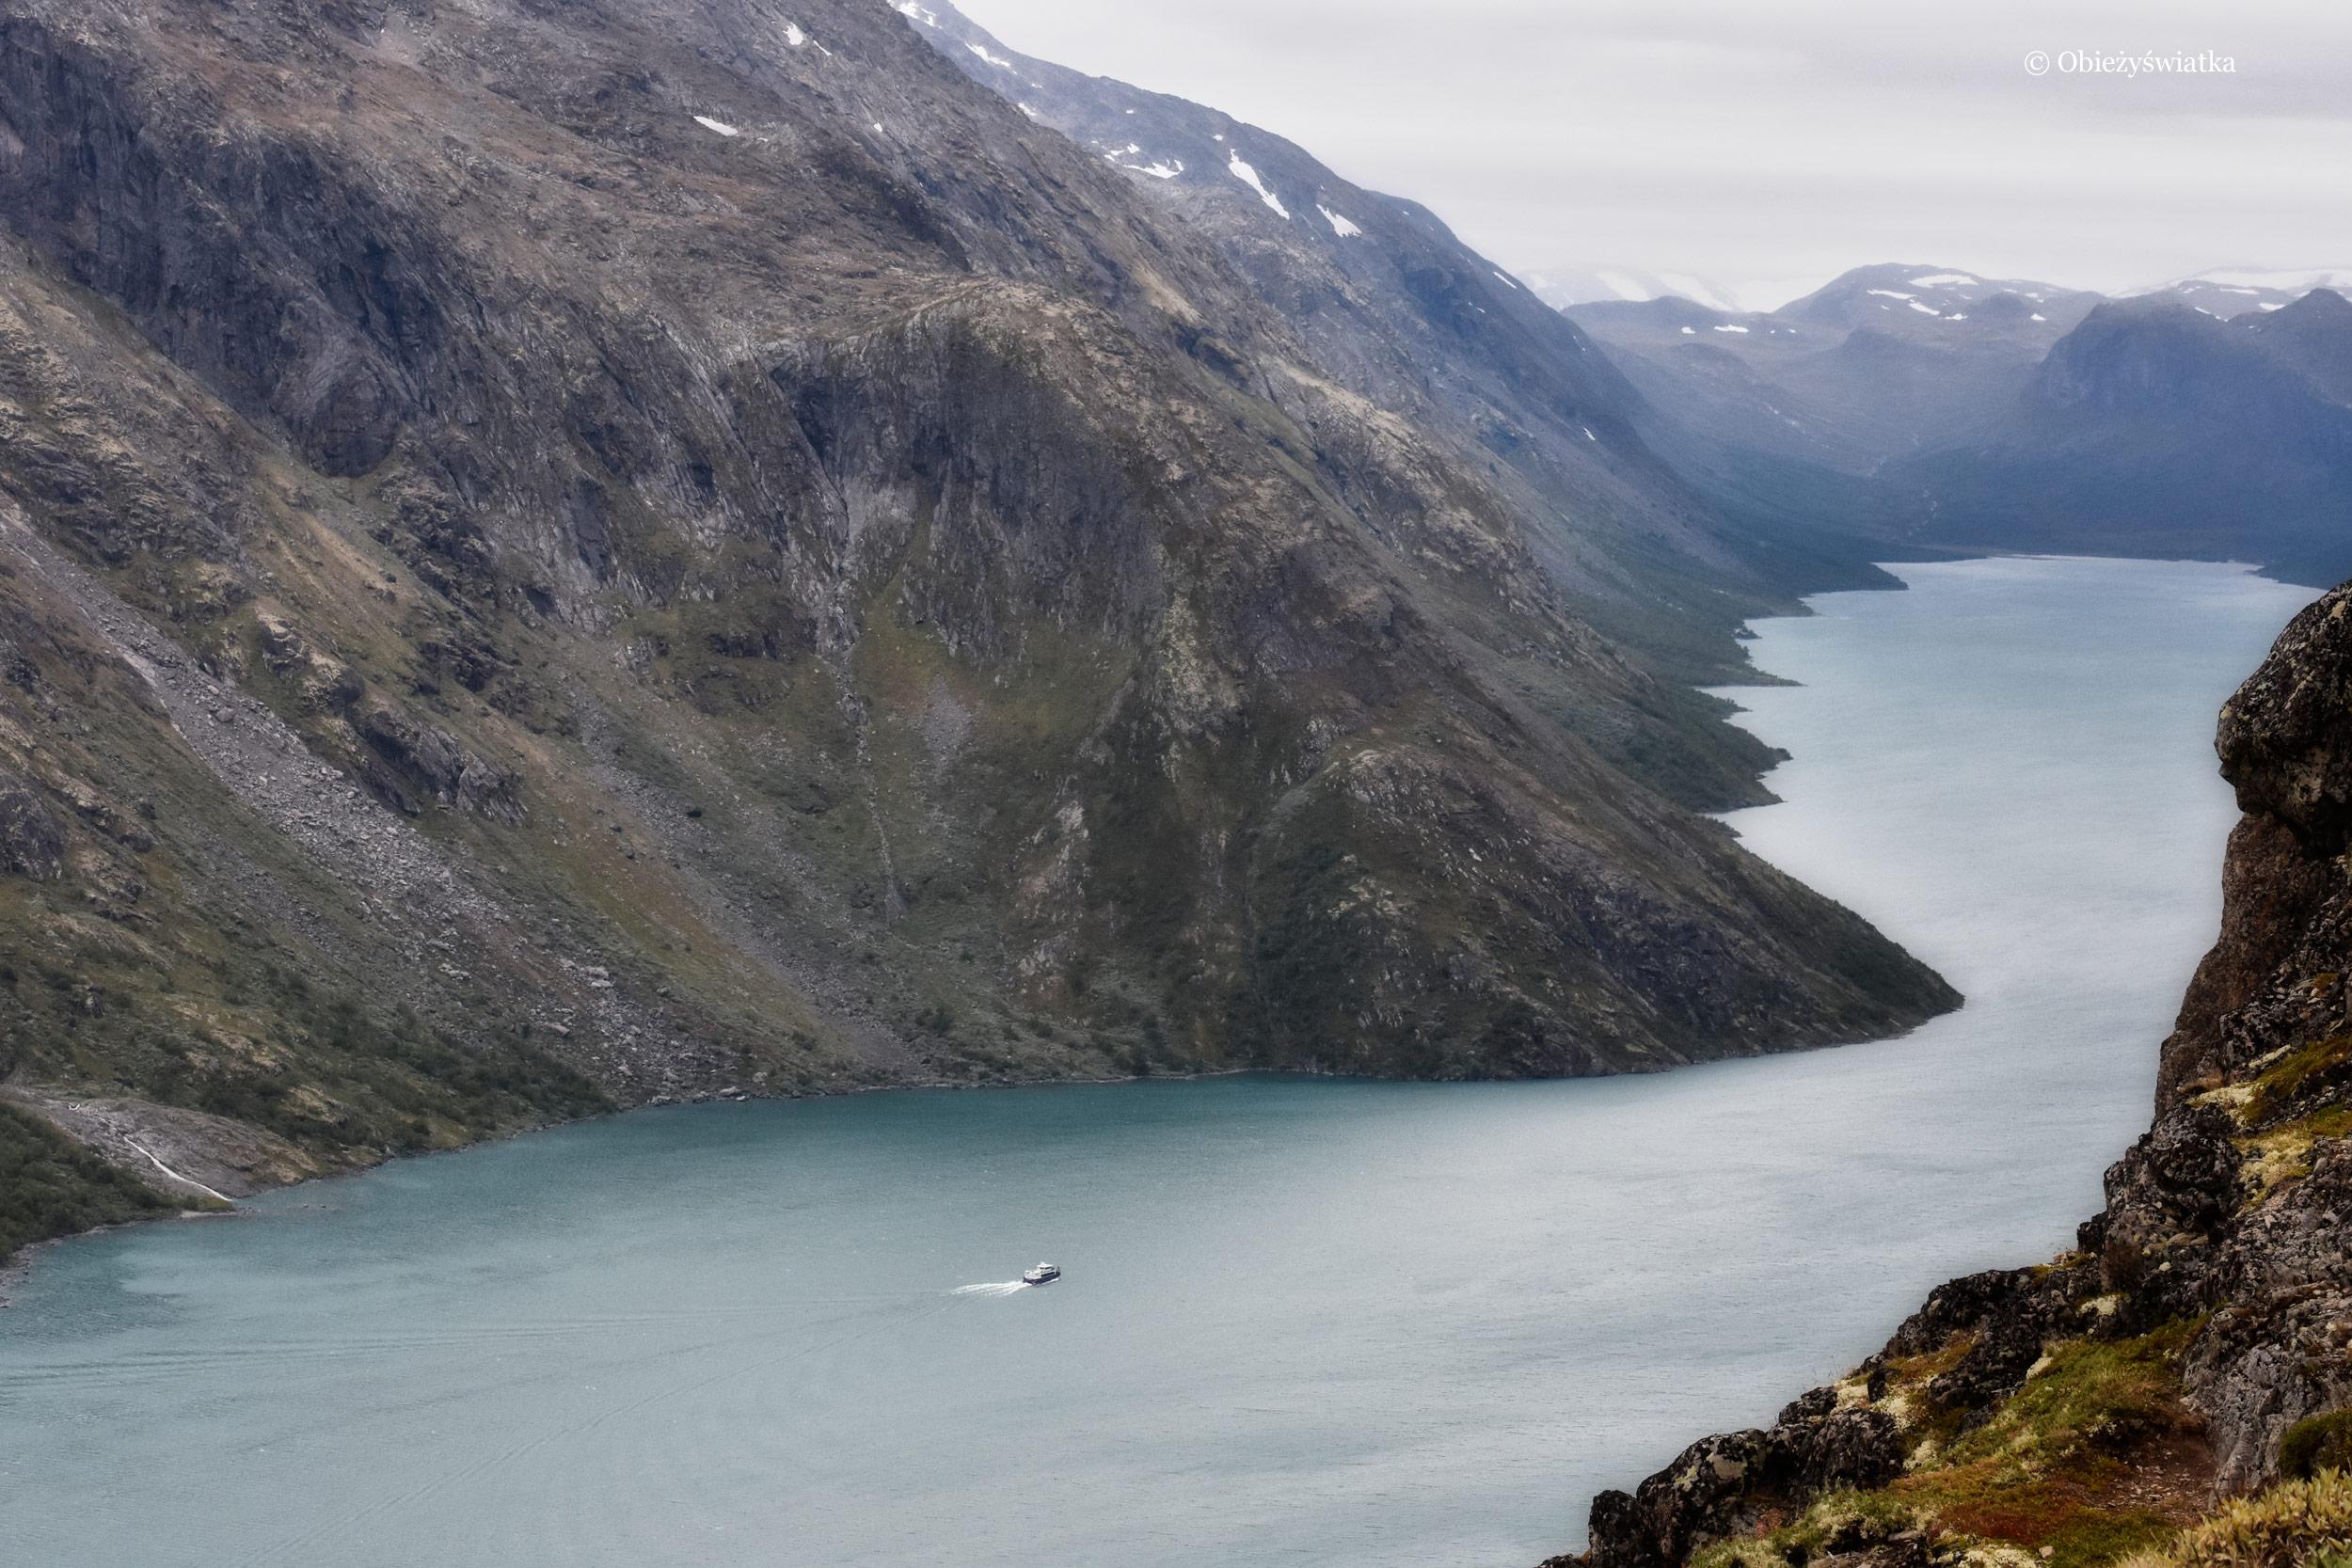 Jezioro Gjende, Norwegia